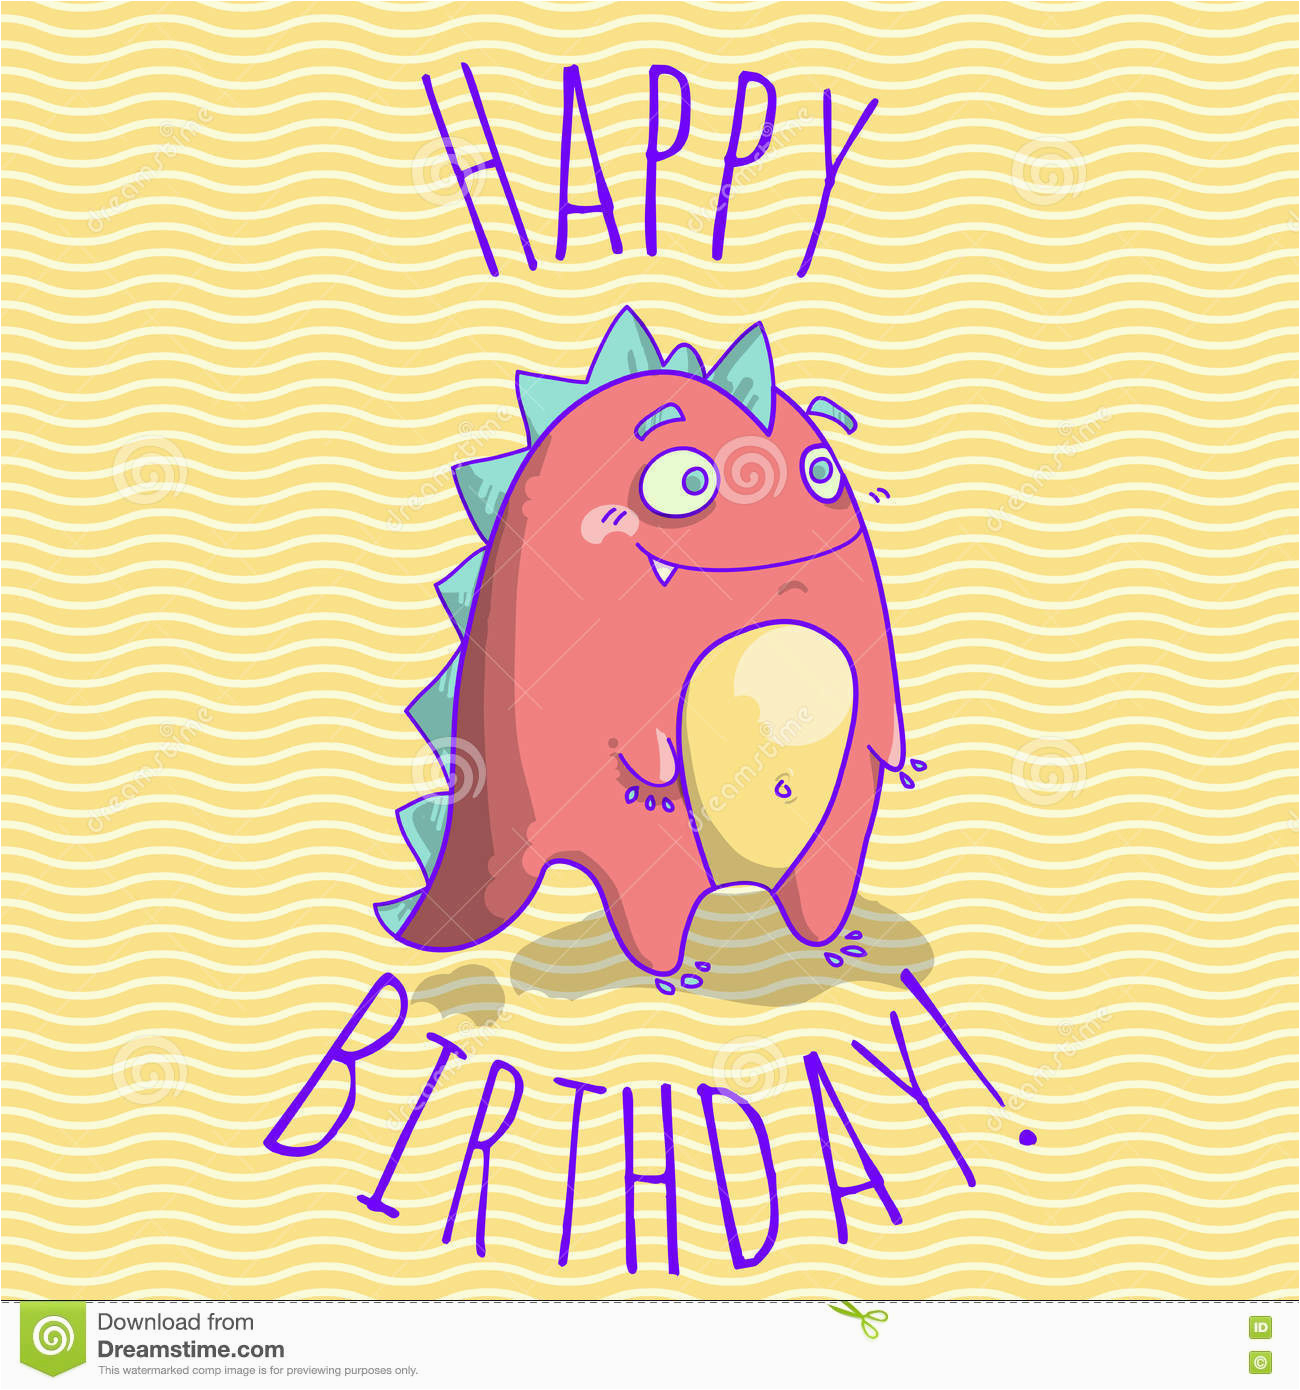 stock illustration happy birthday card template children funny dinosaur character vector illustration image75508291